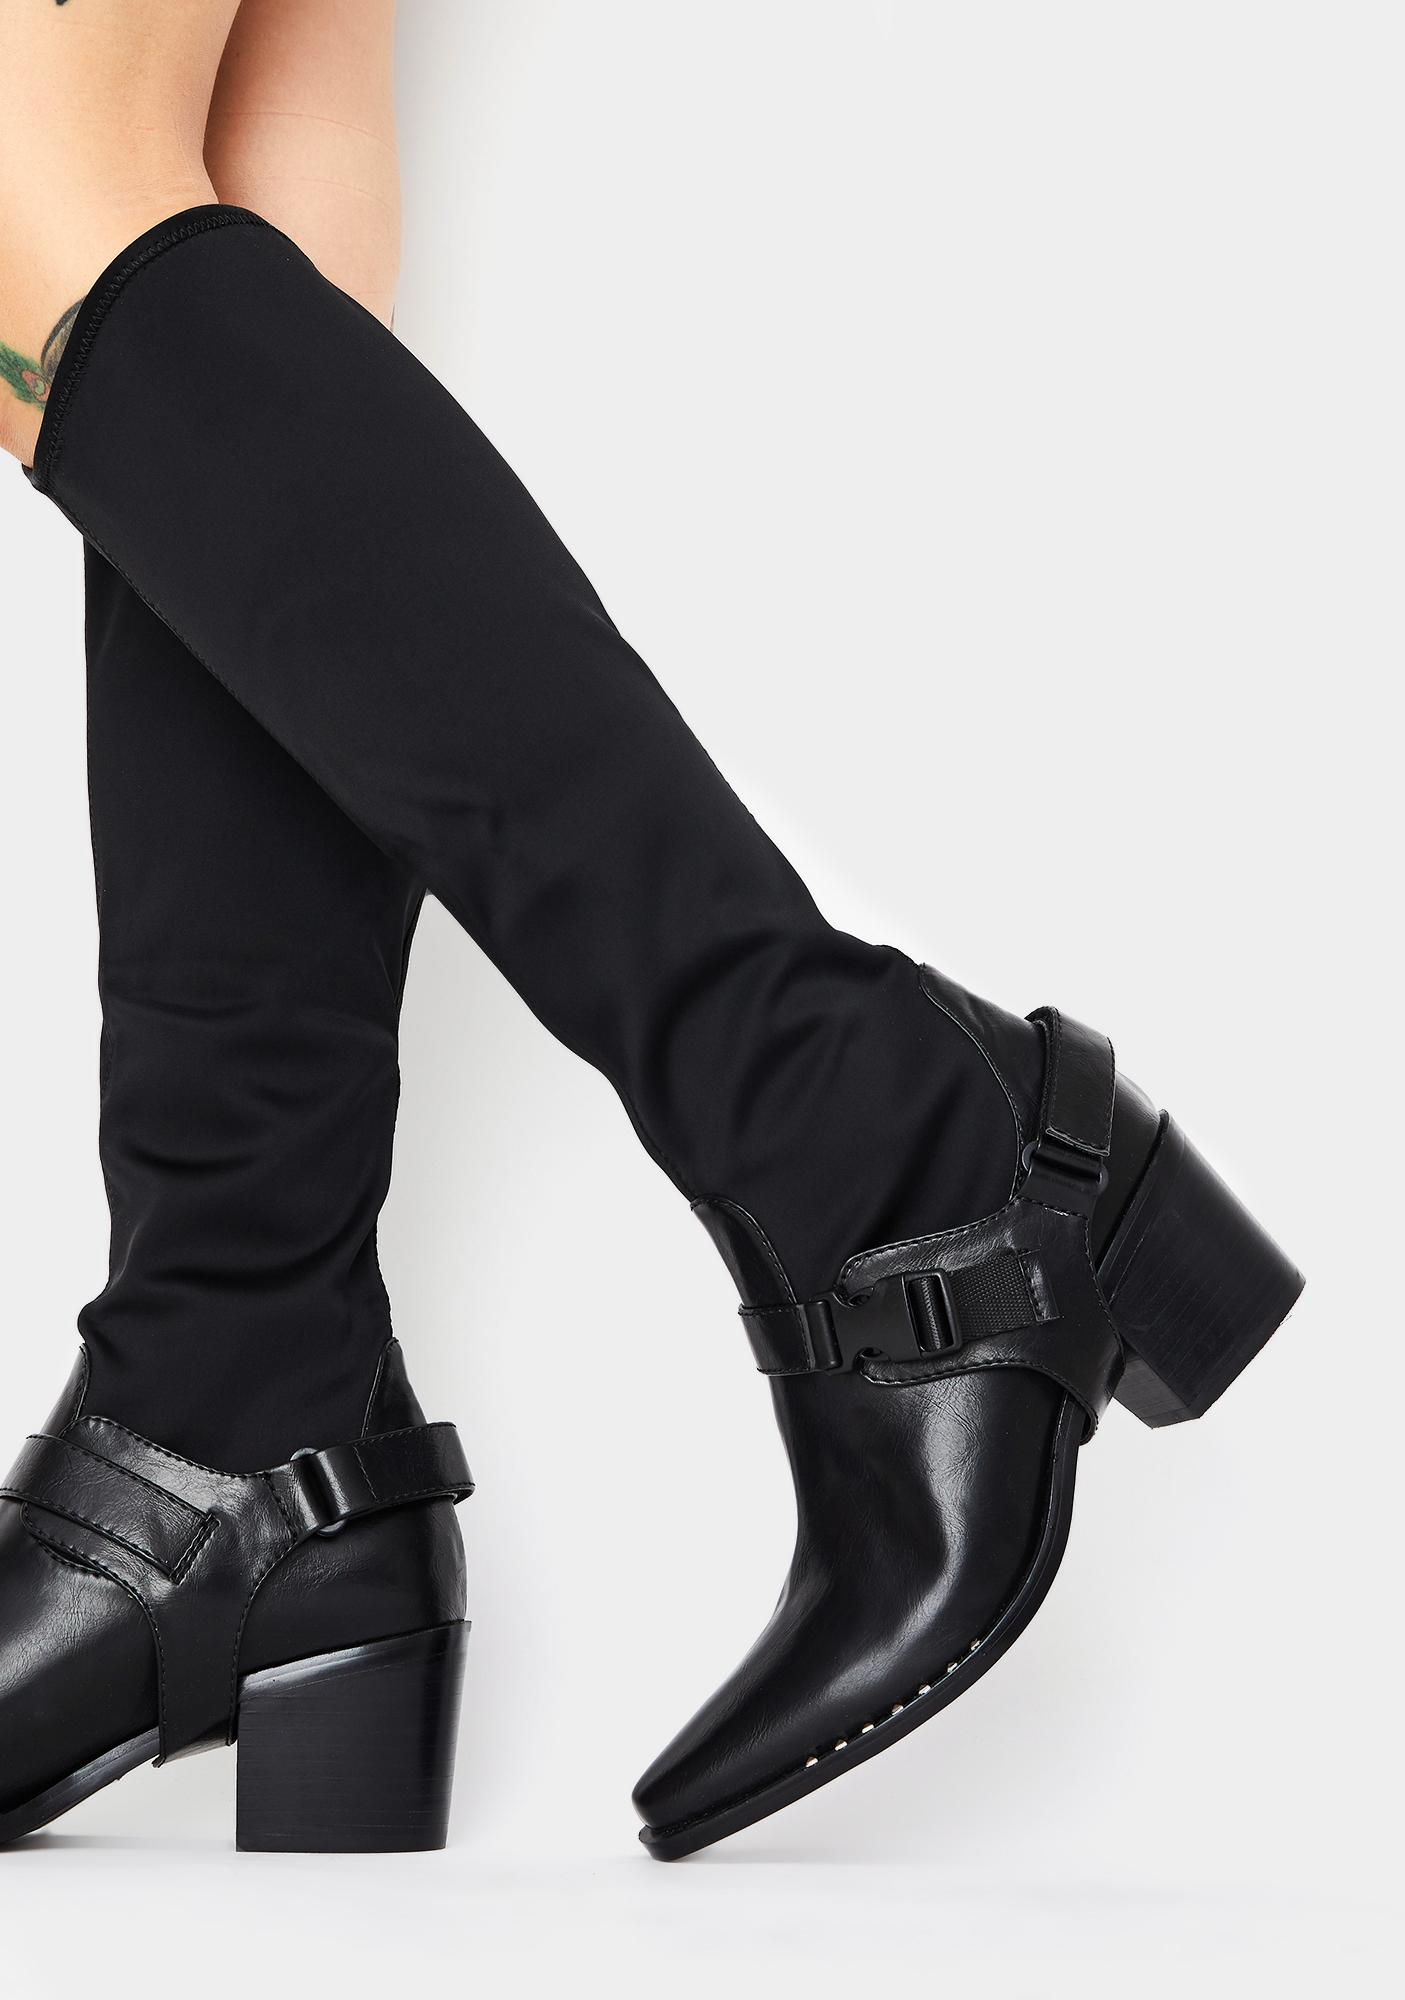 Rebels Parisa Knee High Boots